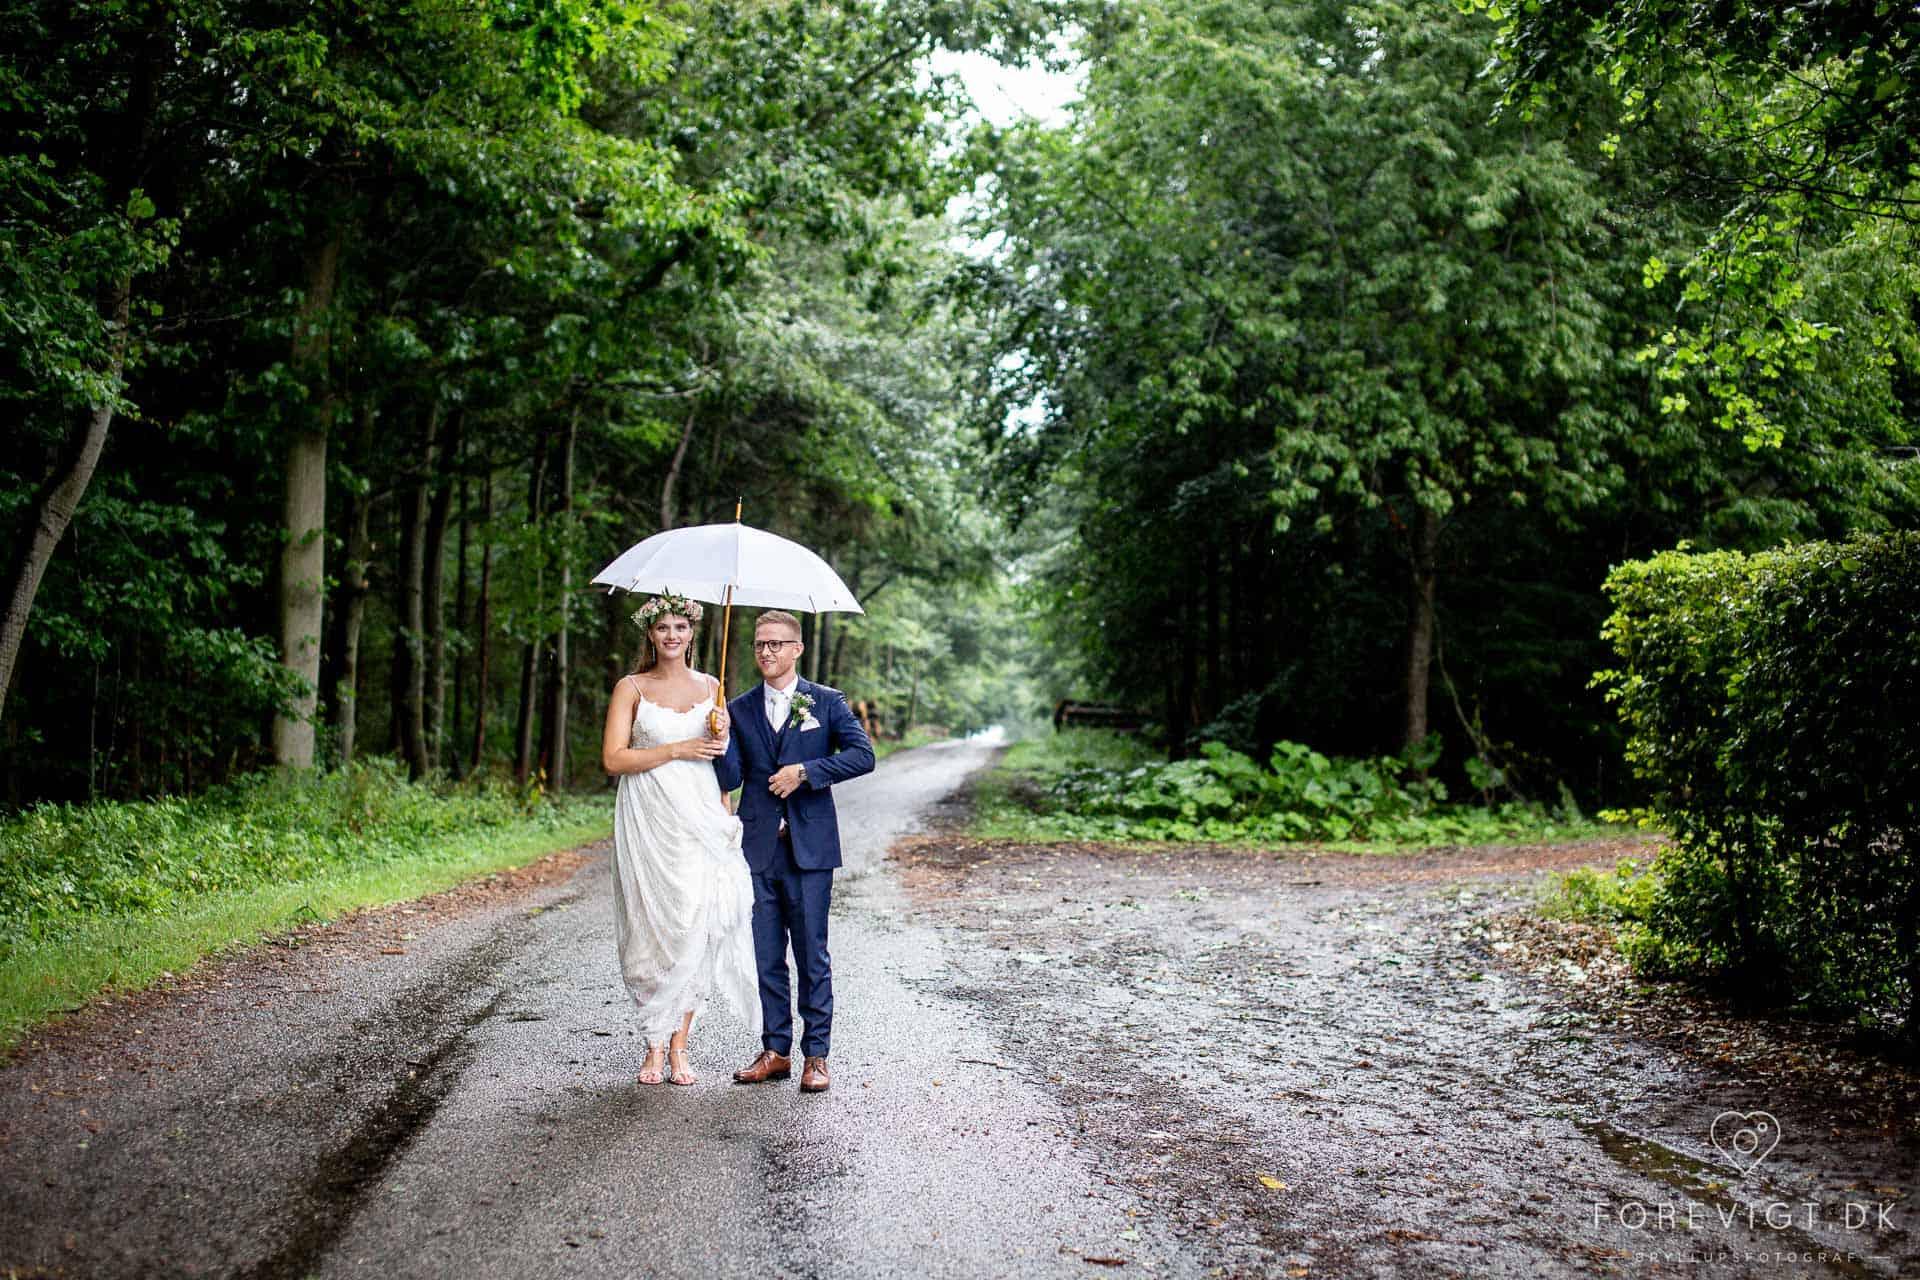 Bryllupsportrætter - Fotograf bryllup